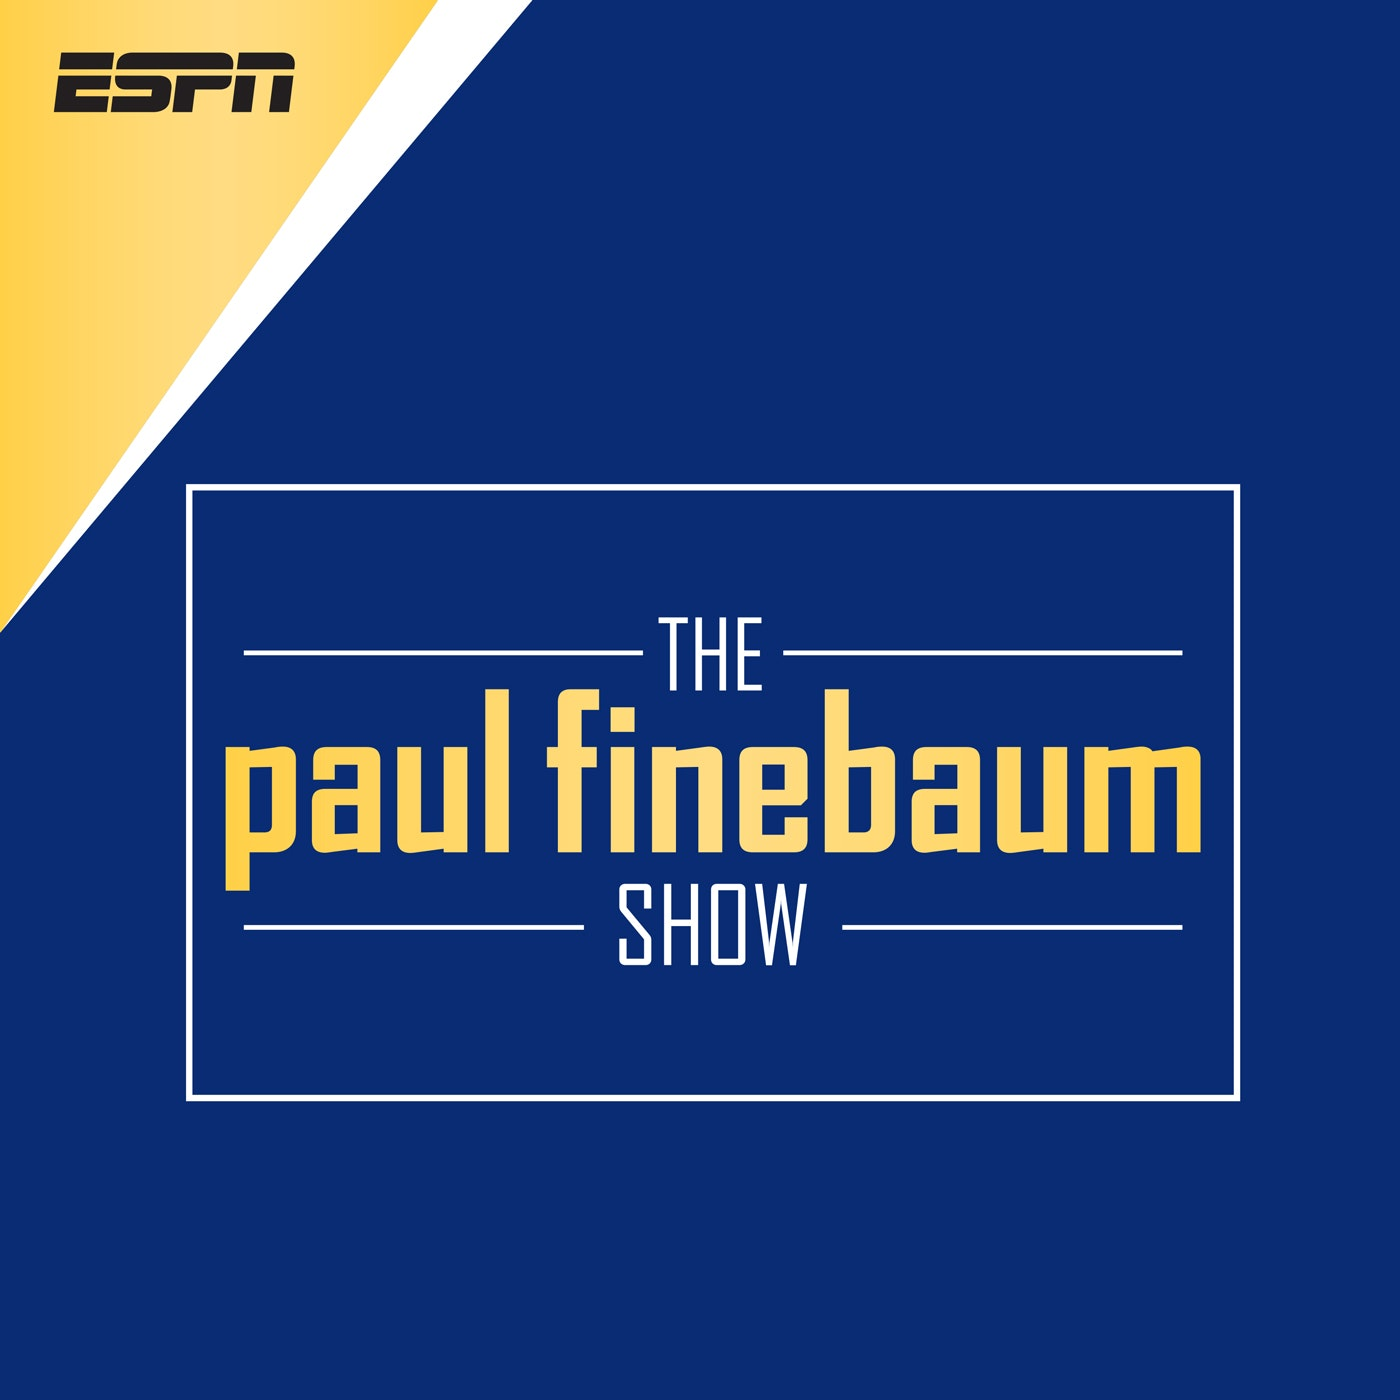 The Paul Finebaum Show podcast